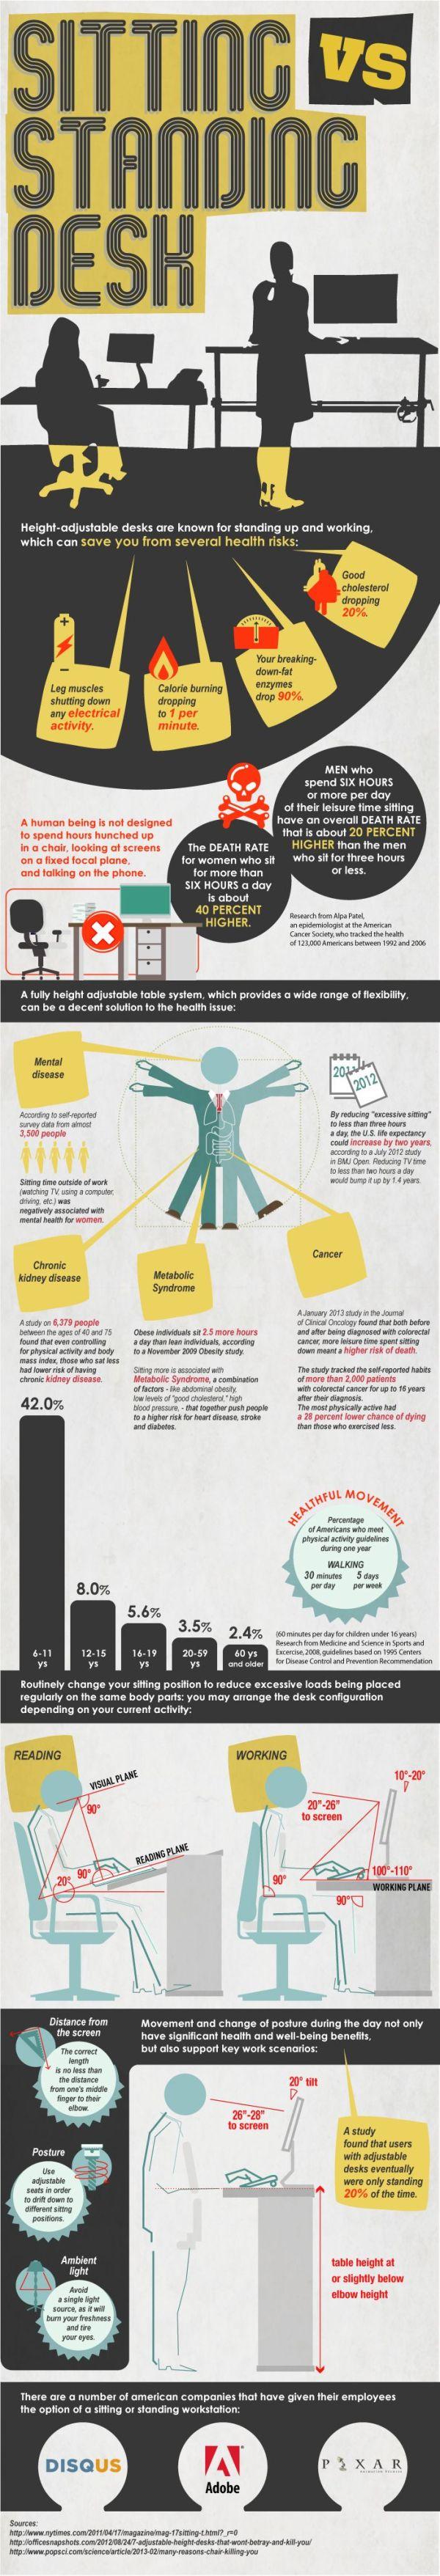 sitting versus standing desk ergonomics